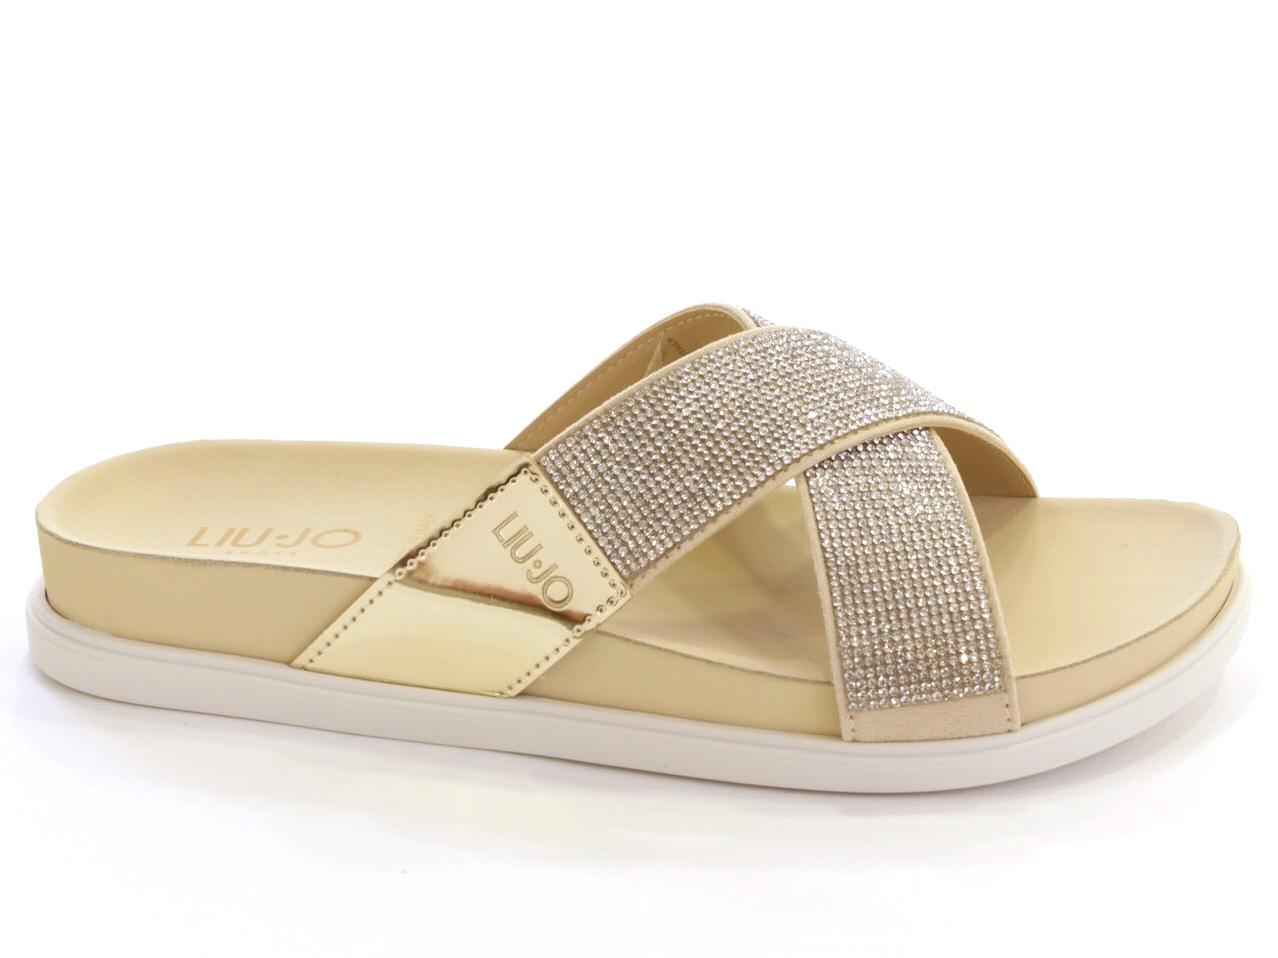 Sandales Plates Liu Jo - 630 S17069